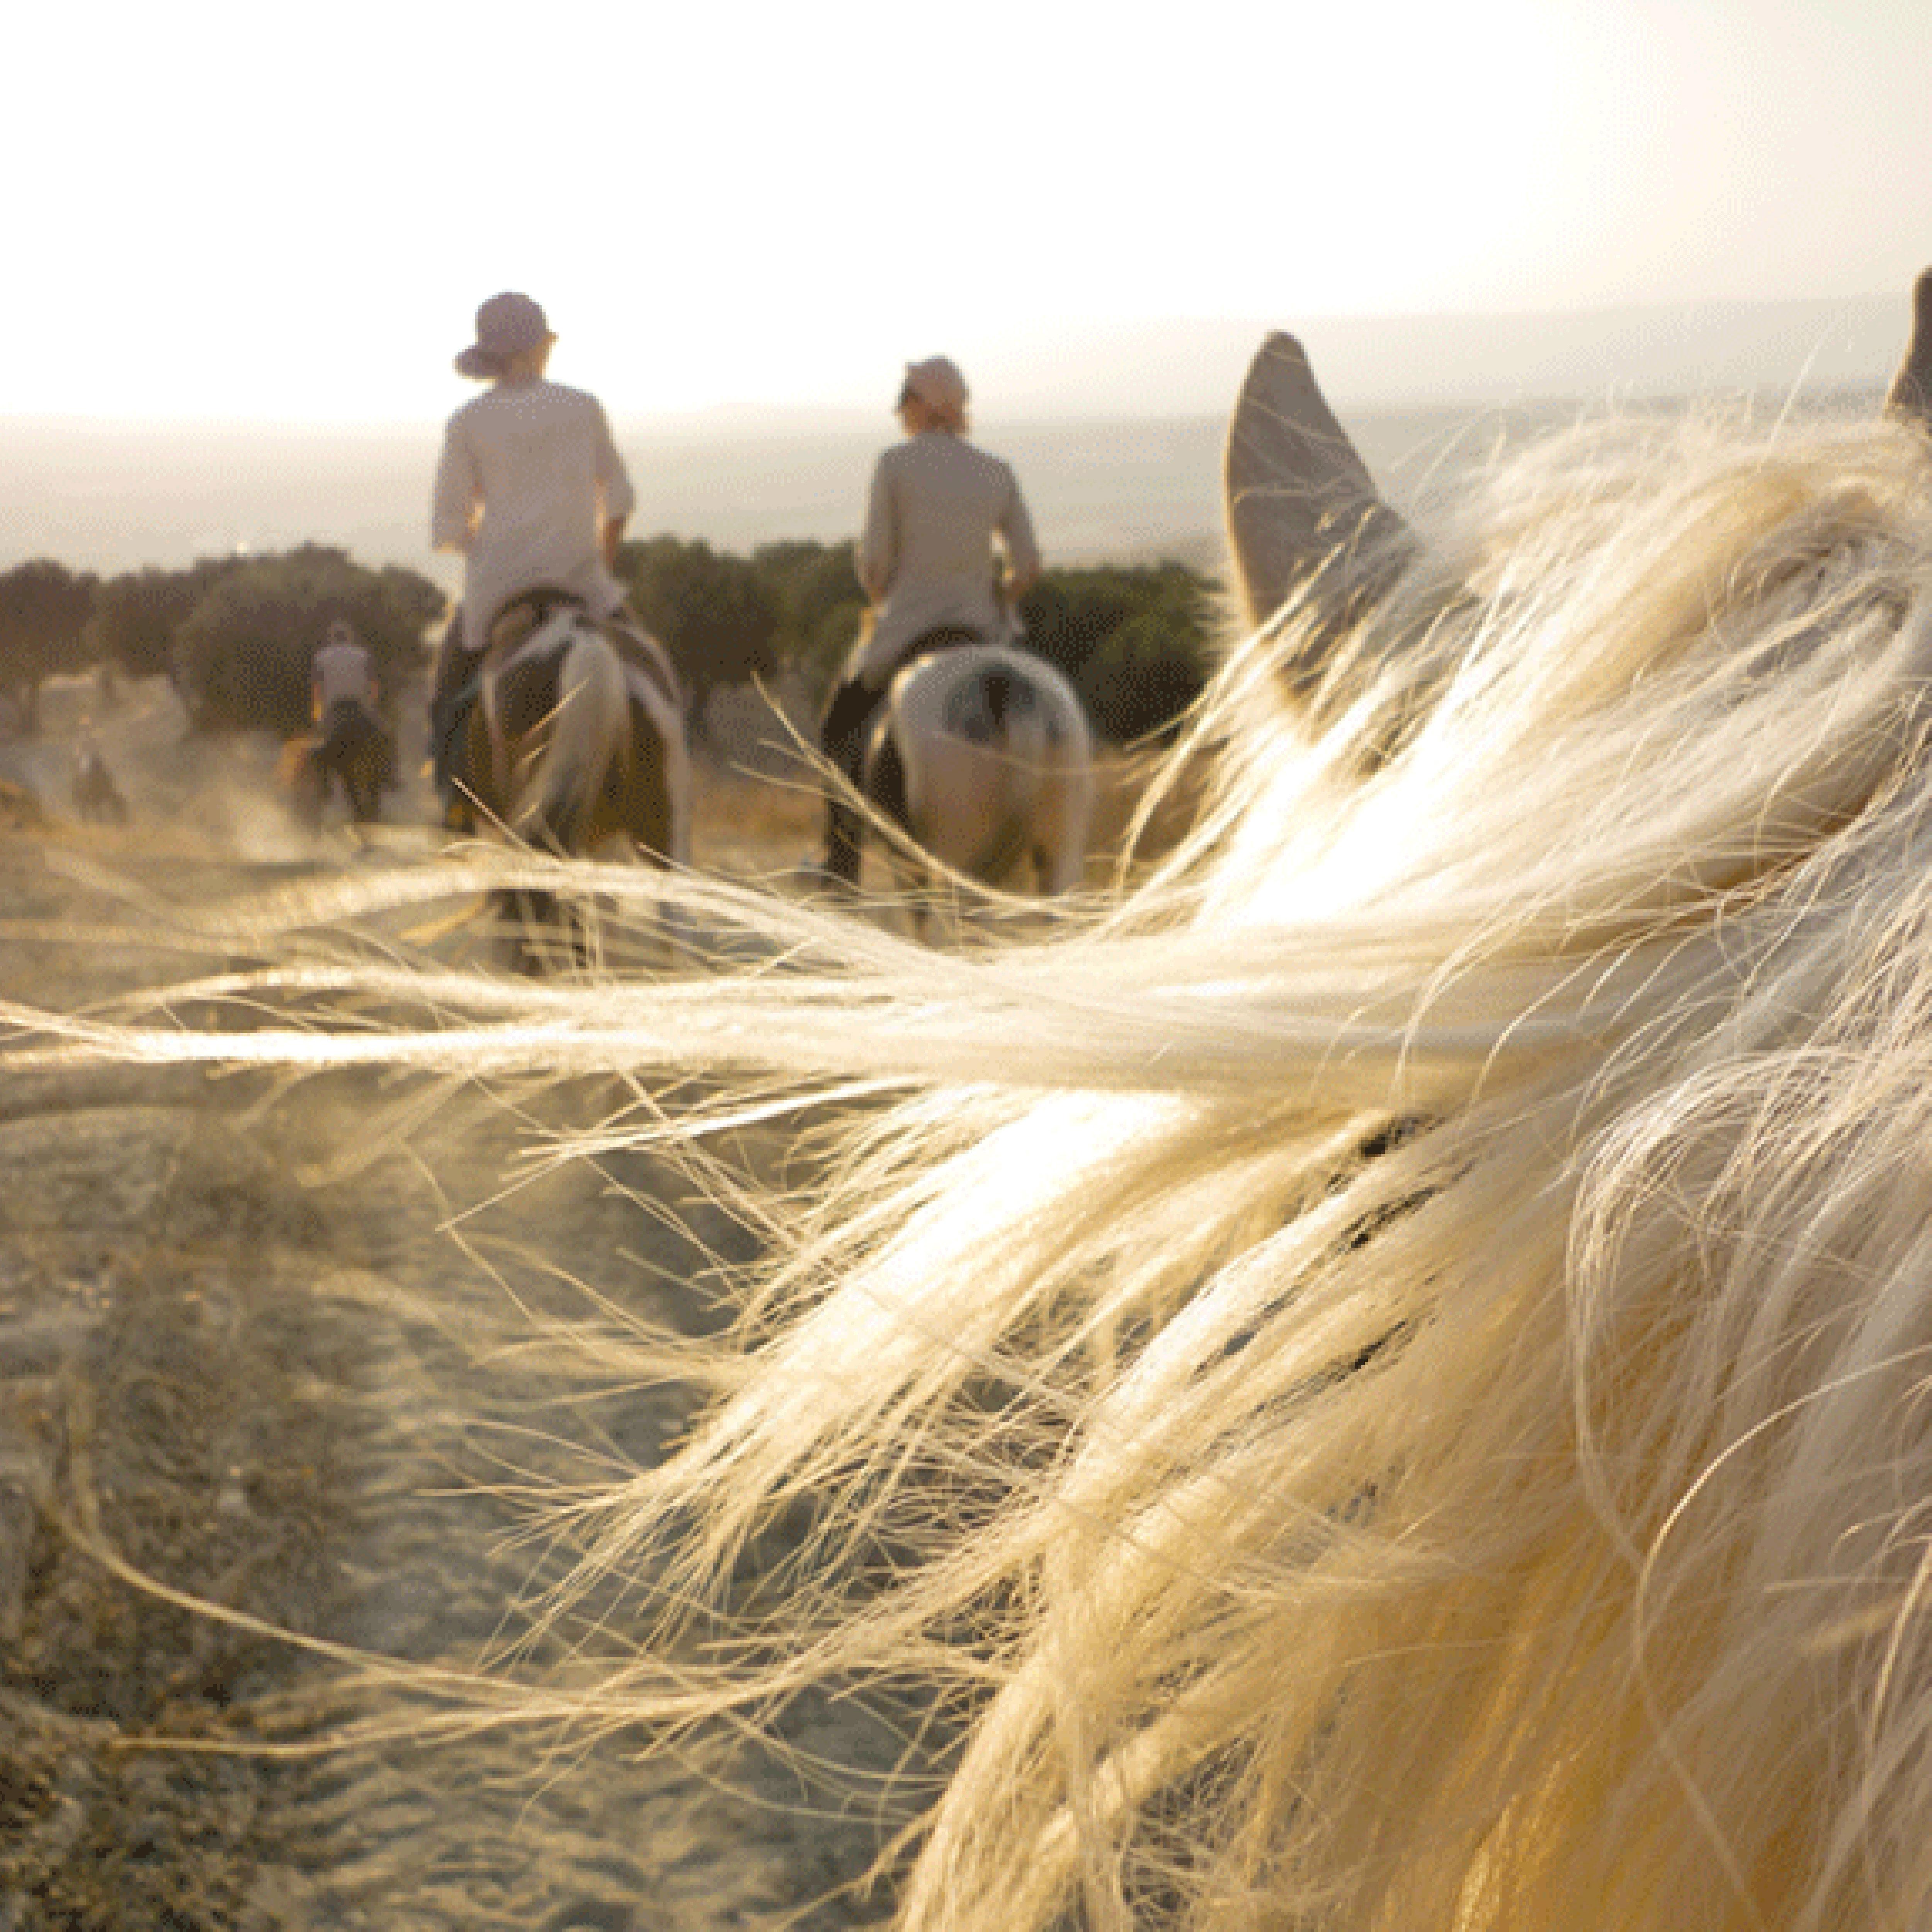 © Emma White | Morocco